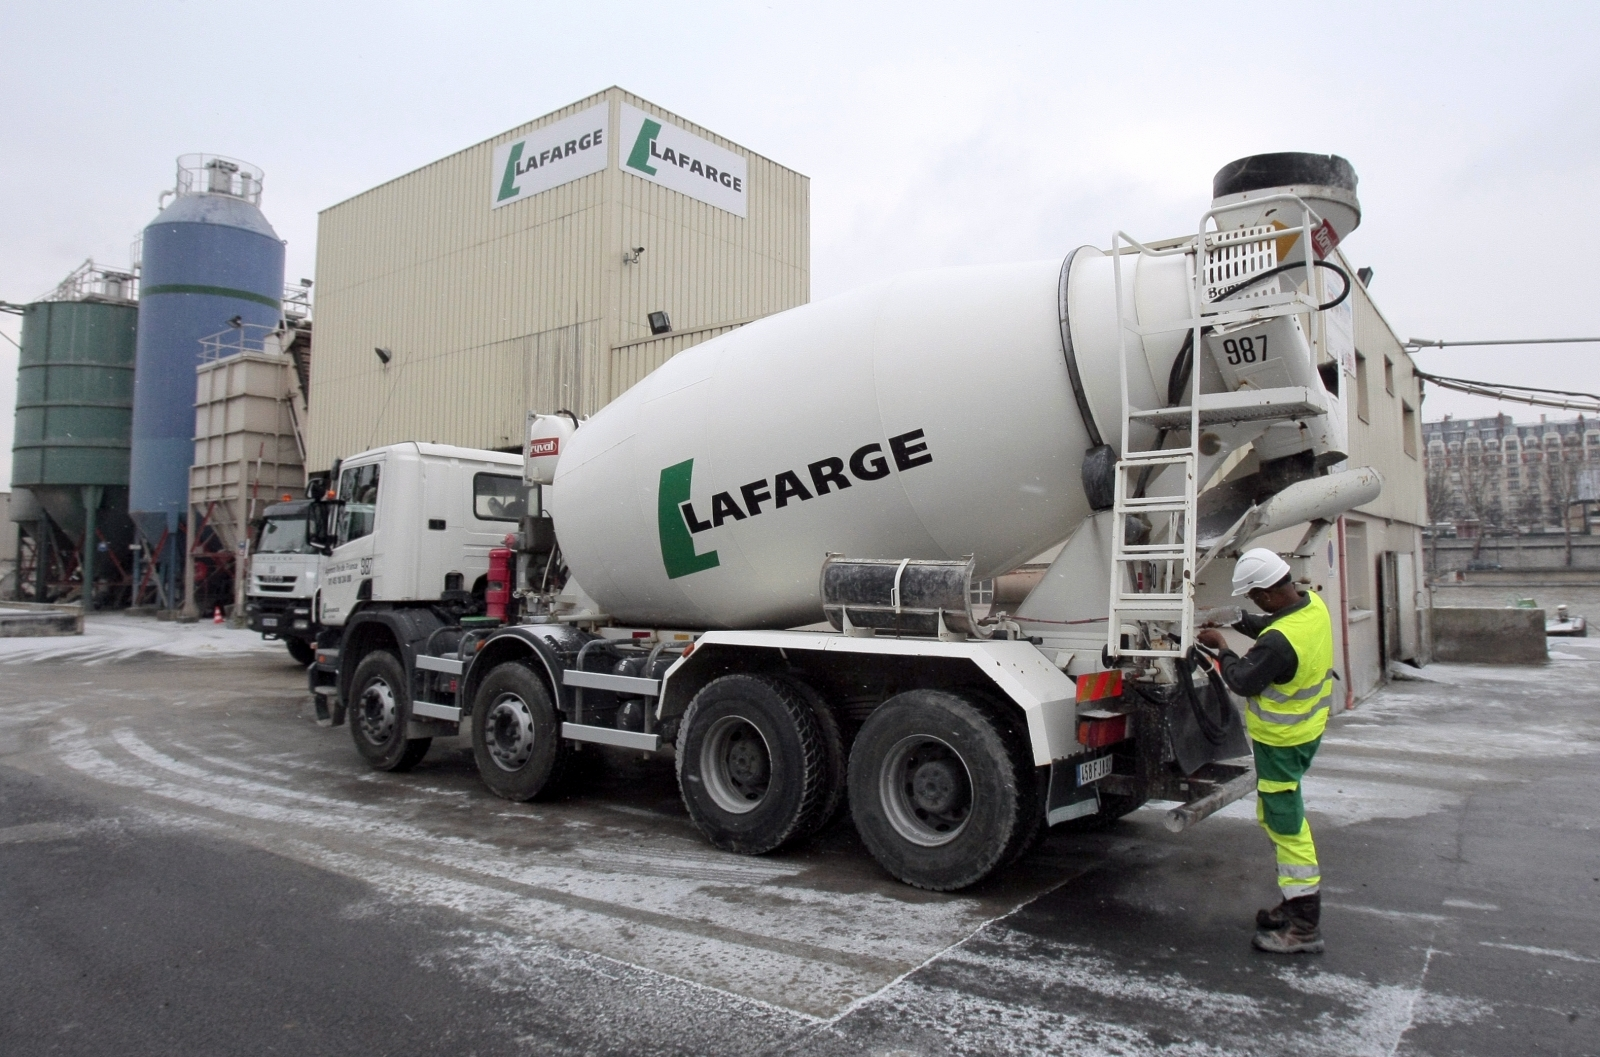 Lafarge cement truck